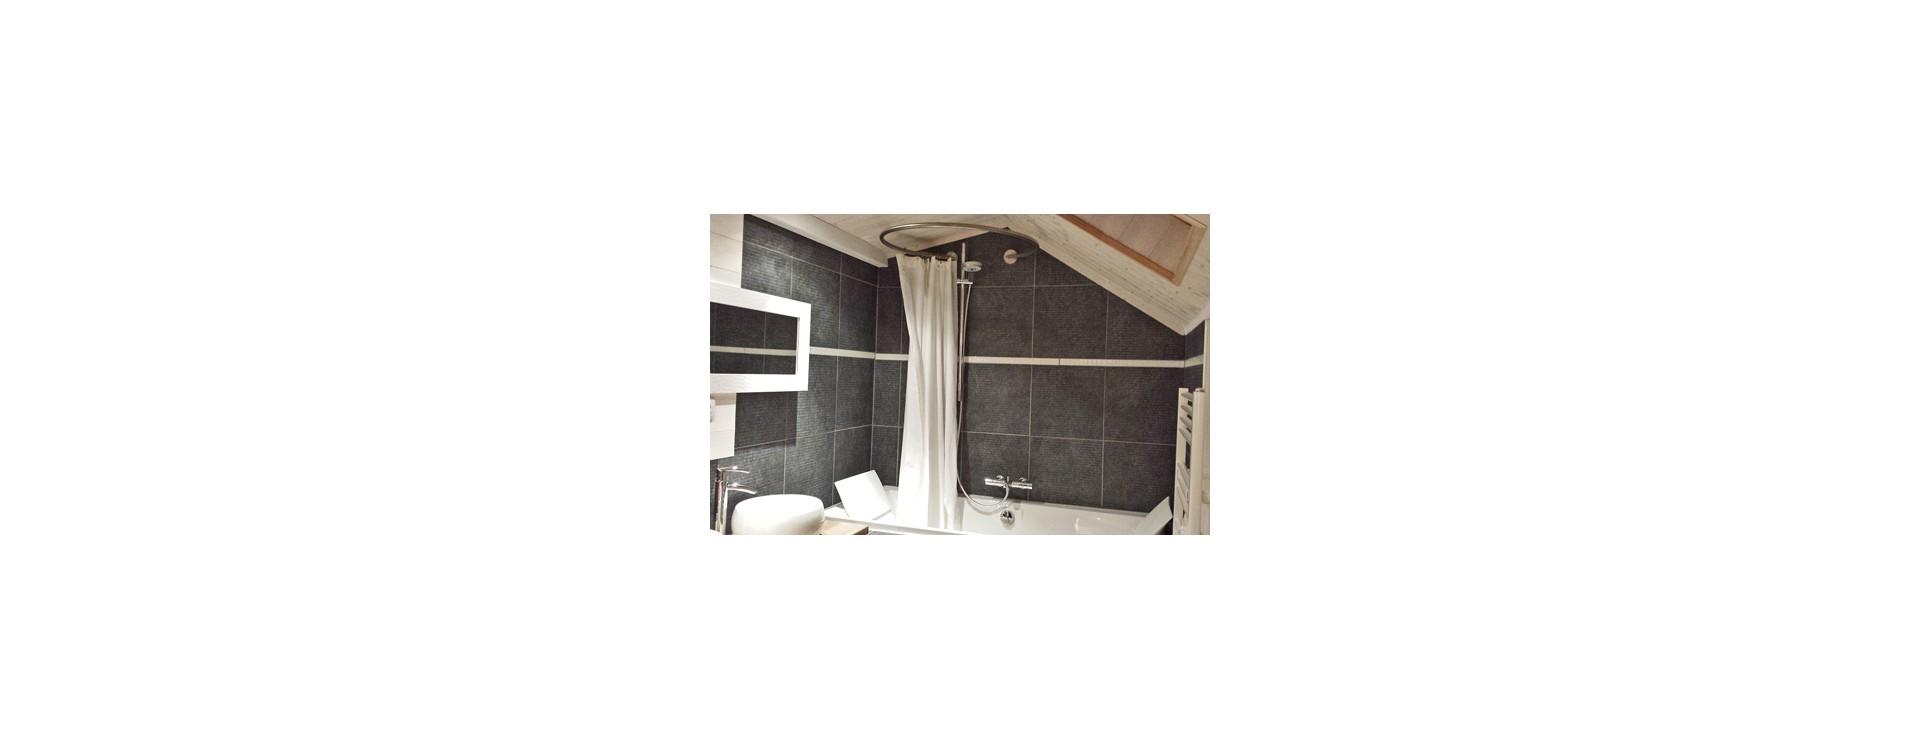 baignoire evok de jacob delafon et cabine de douche circulaire galbobain galbobain. Black Bedroom Furniture Sets. Home Design Ideas